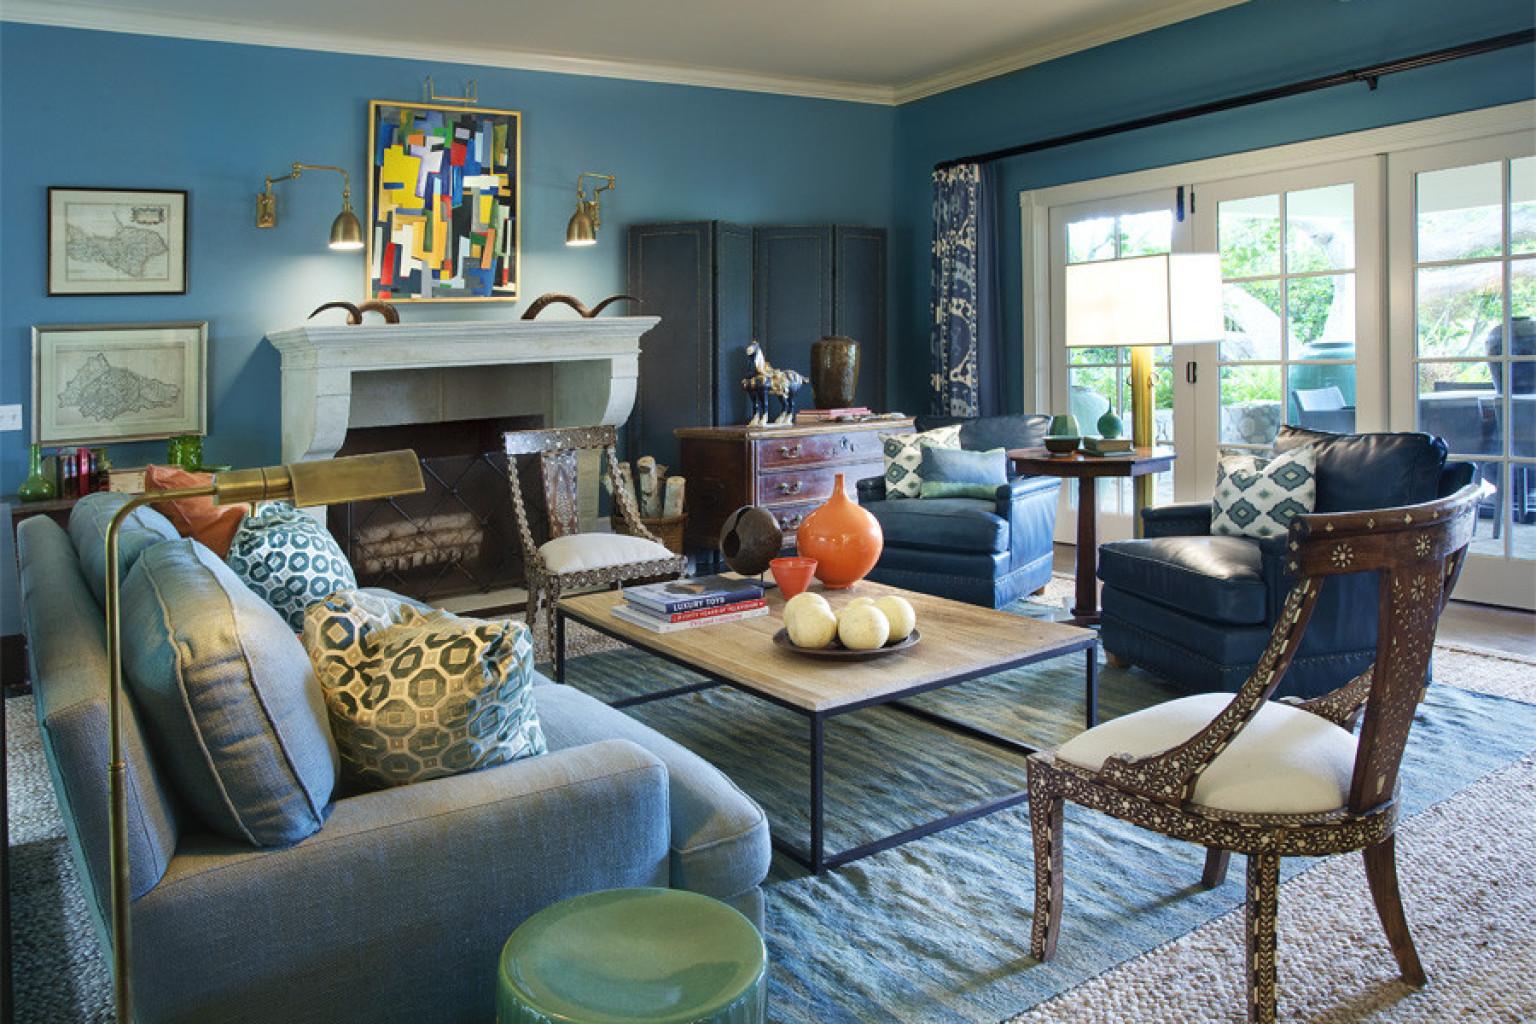 Designer Showhouse Take A Tour Of The Santa Barbara